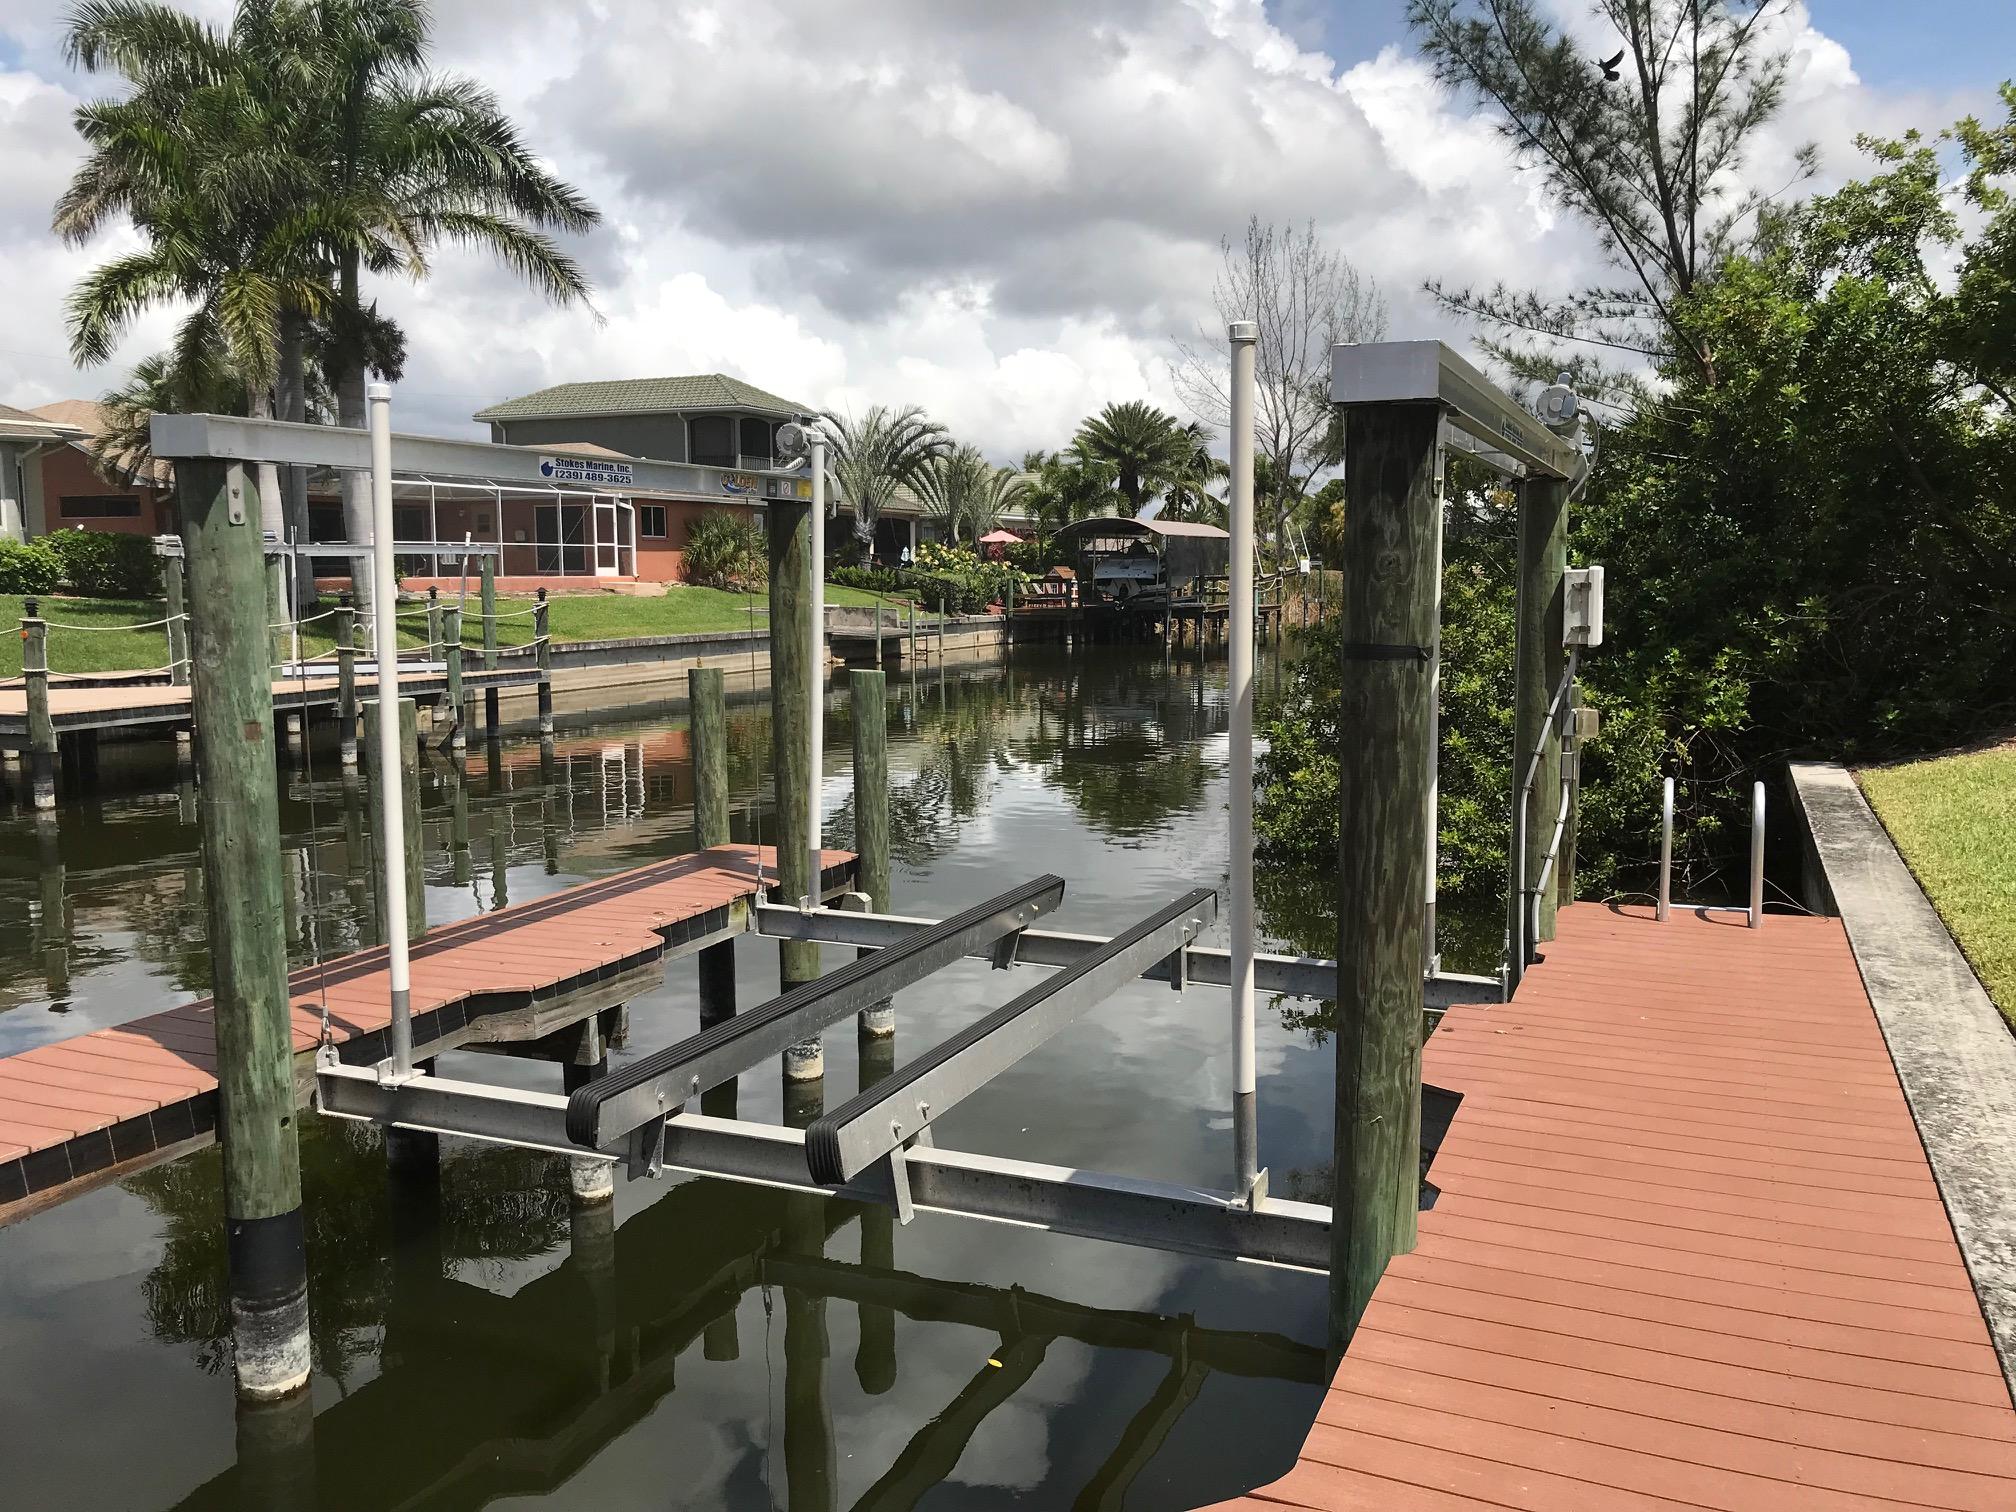 Ferienvilla Cape Coral kaufen - Immobilien Cape Coral, Makler Cape Coral Claudia Junk, Posh International Properties